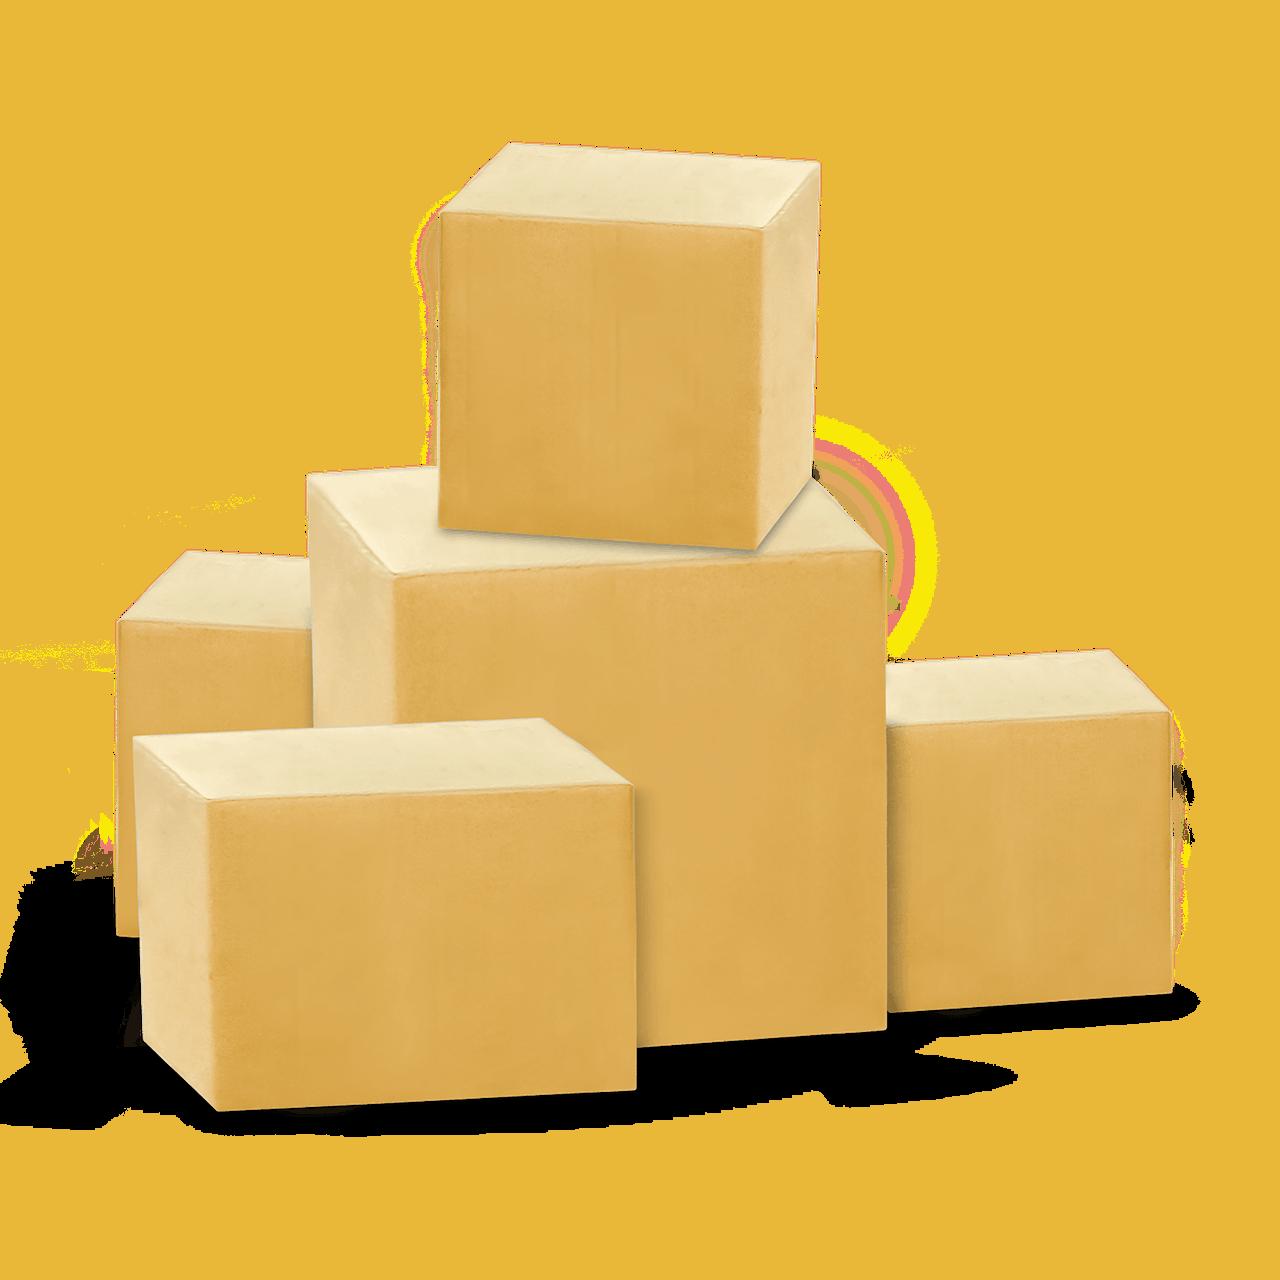 Boxes 1551968477 - איך לבחור חברת הובלות לצורך הובלת דירה?